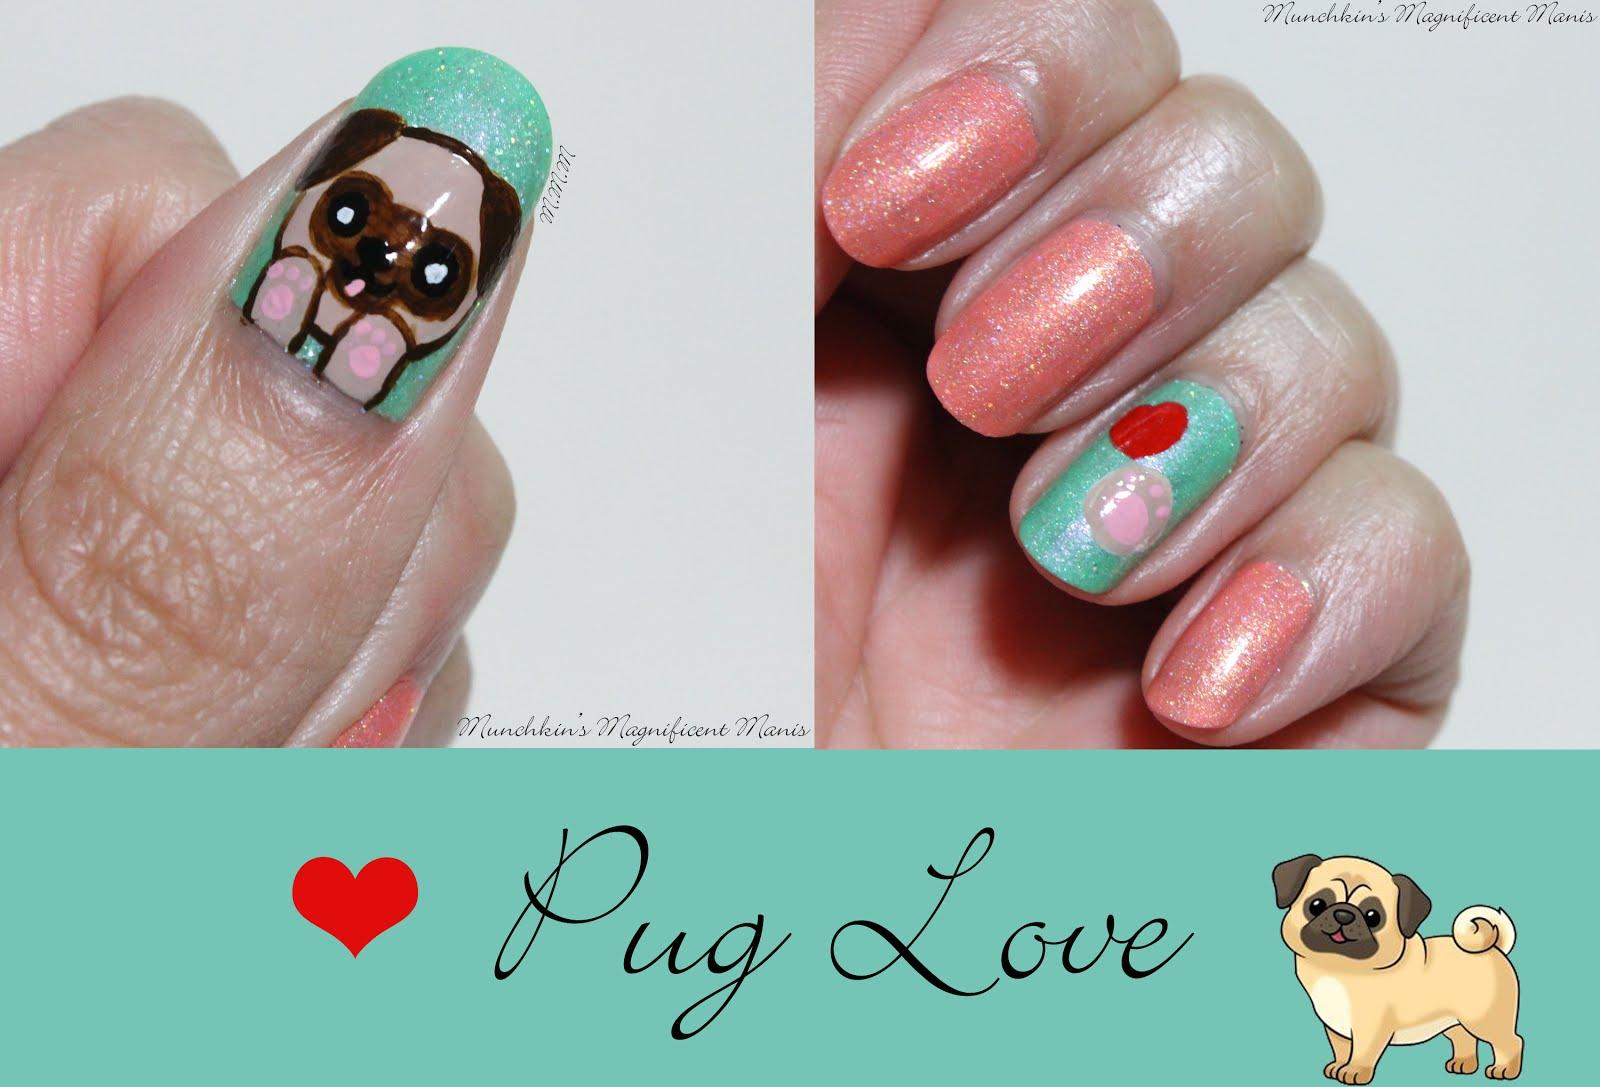 Munchkin\'s Magnificent Manis: Pug Love Nail Design